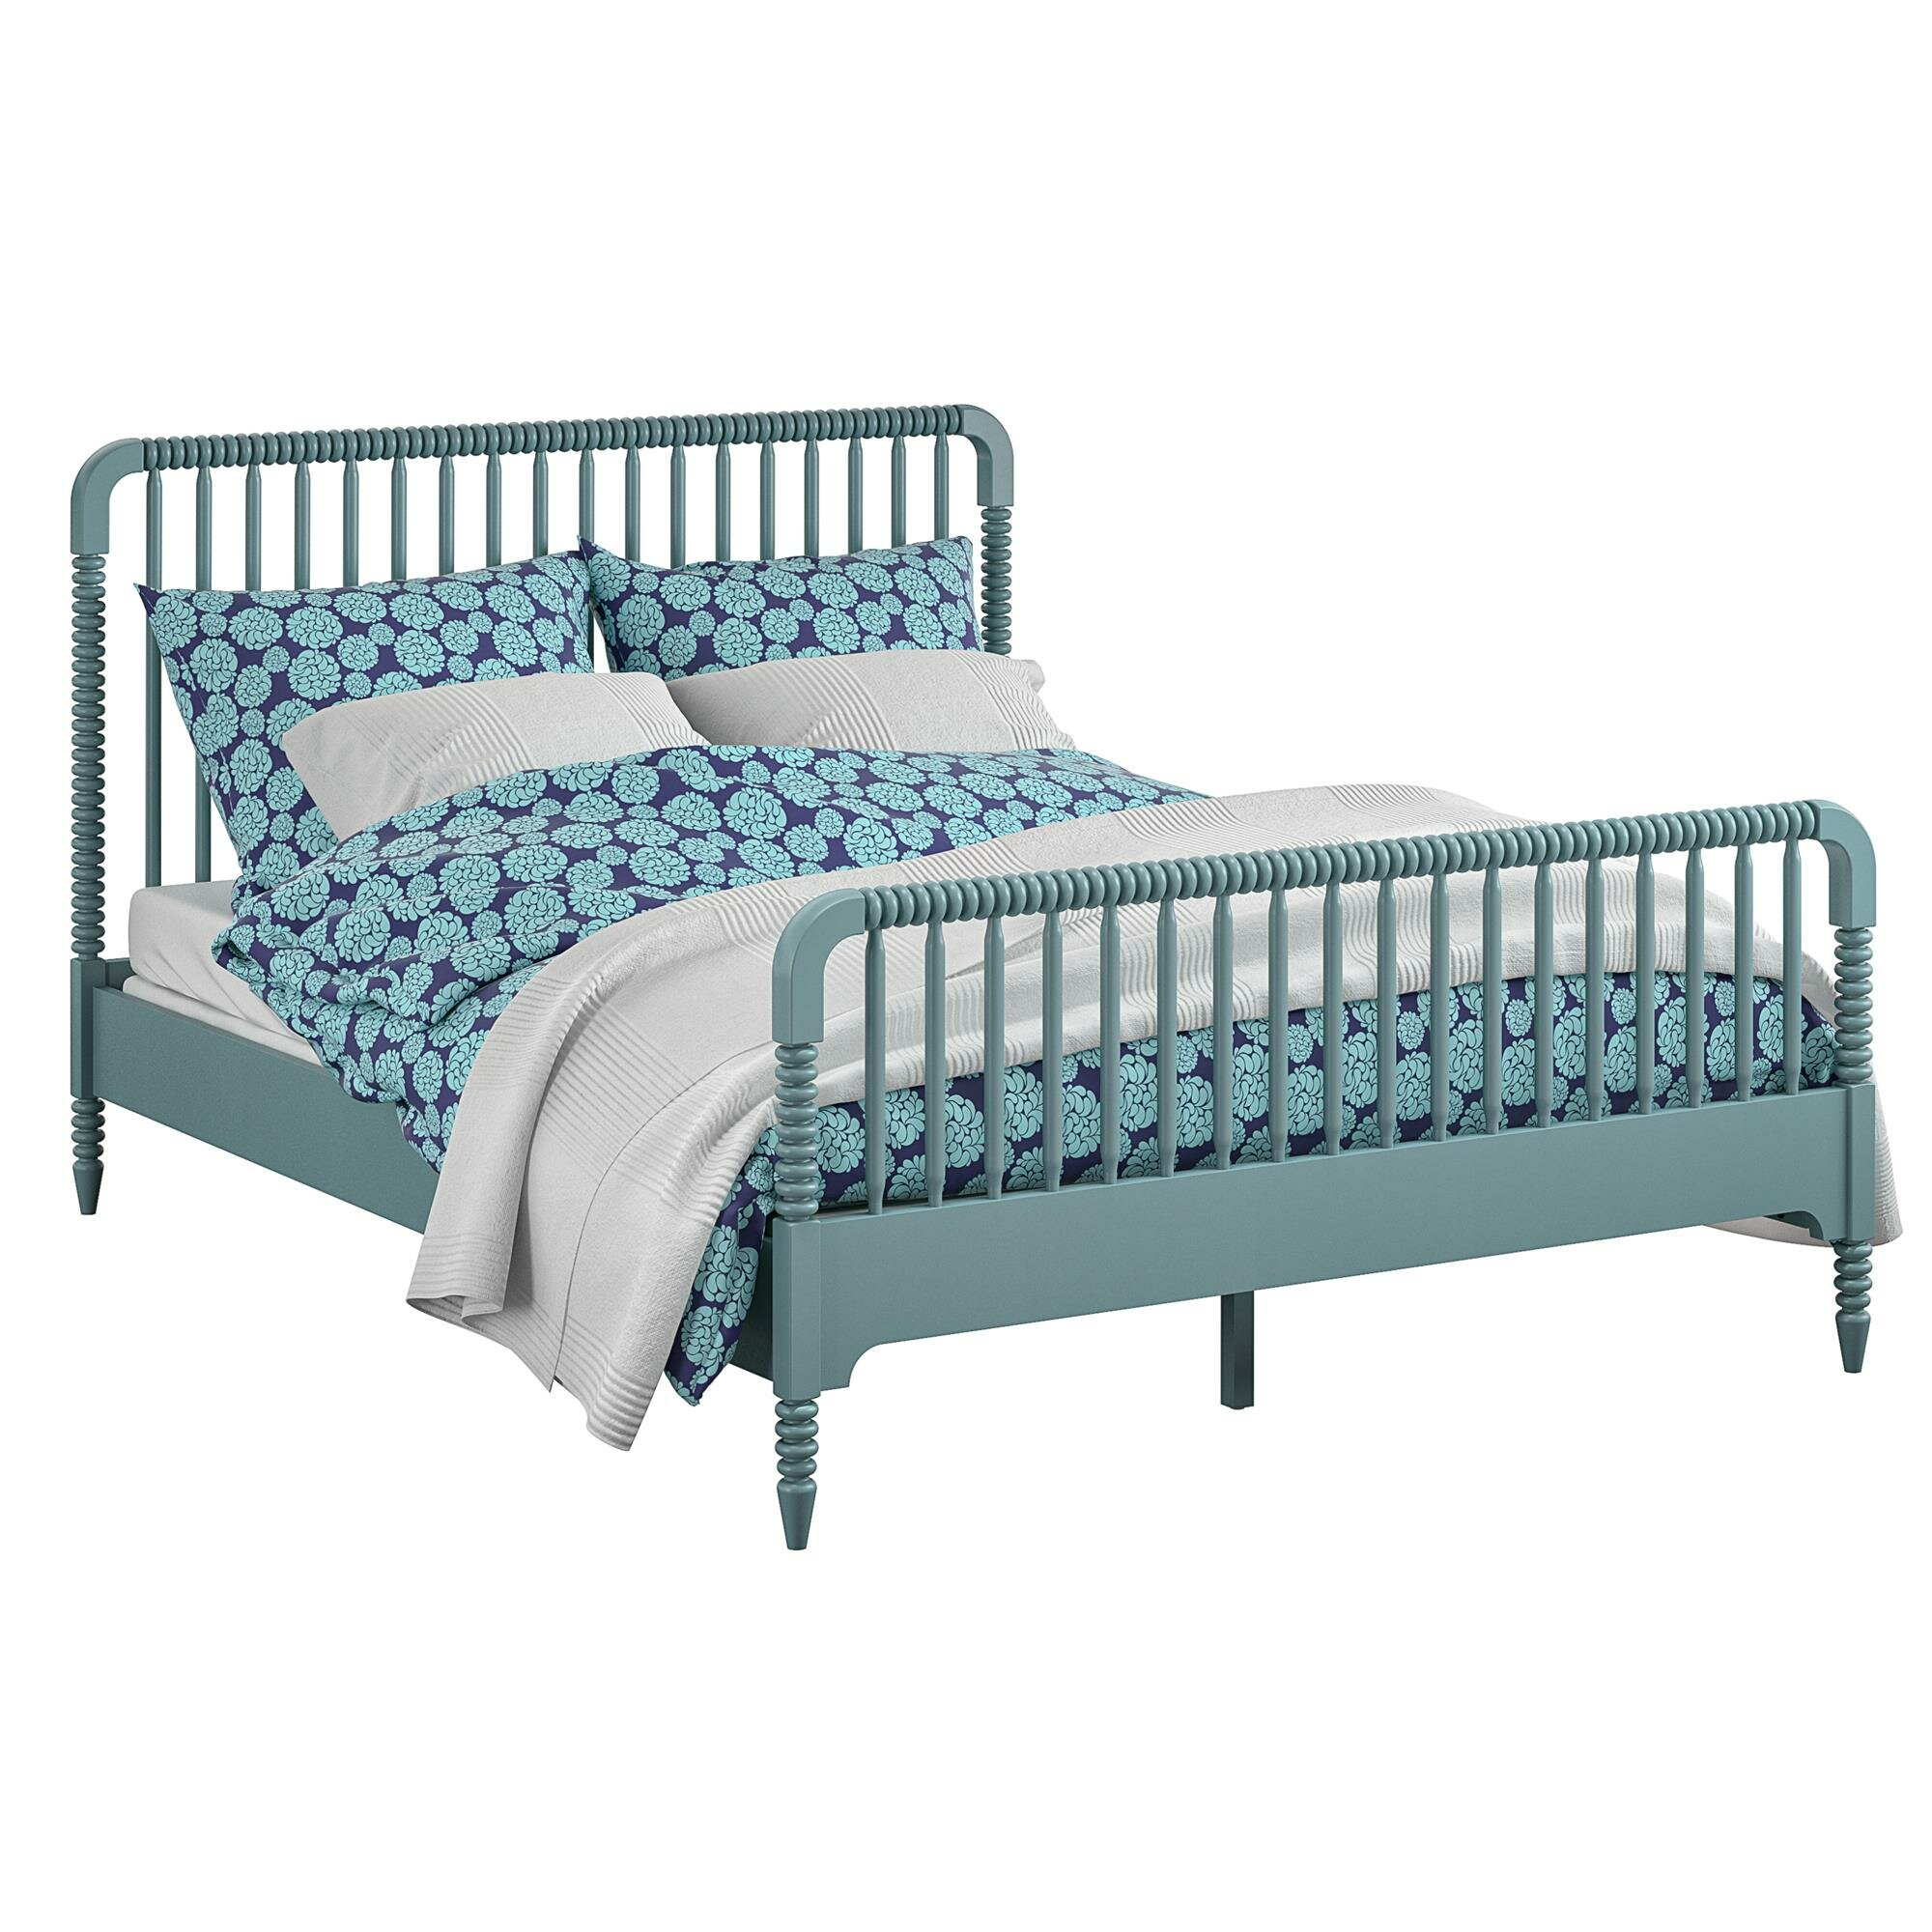 Rowan Valley Linden Bunk Bed Reviews